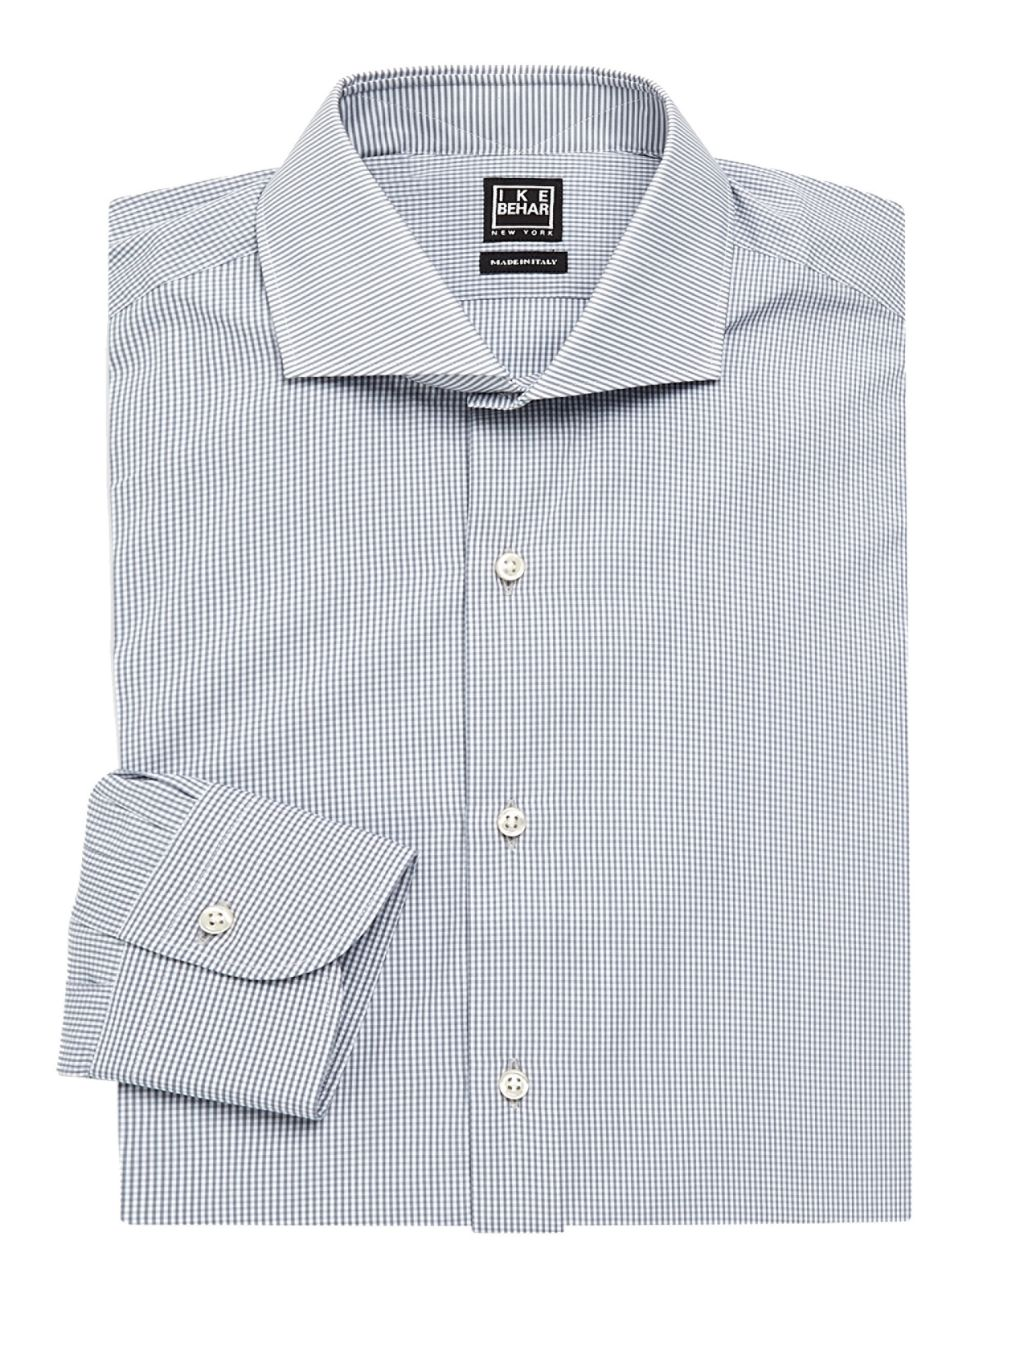 IKE by Ike Behar Modern-Fit Check Dress Shirt